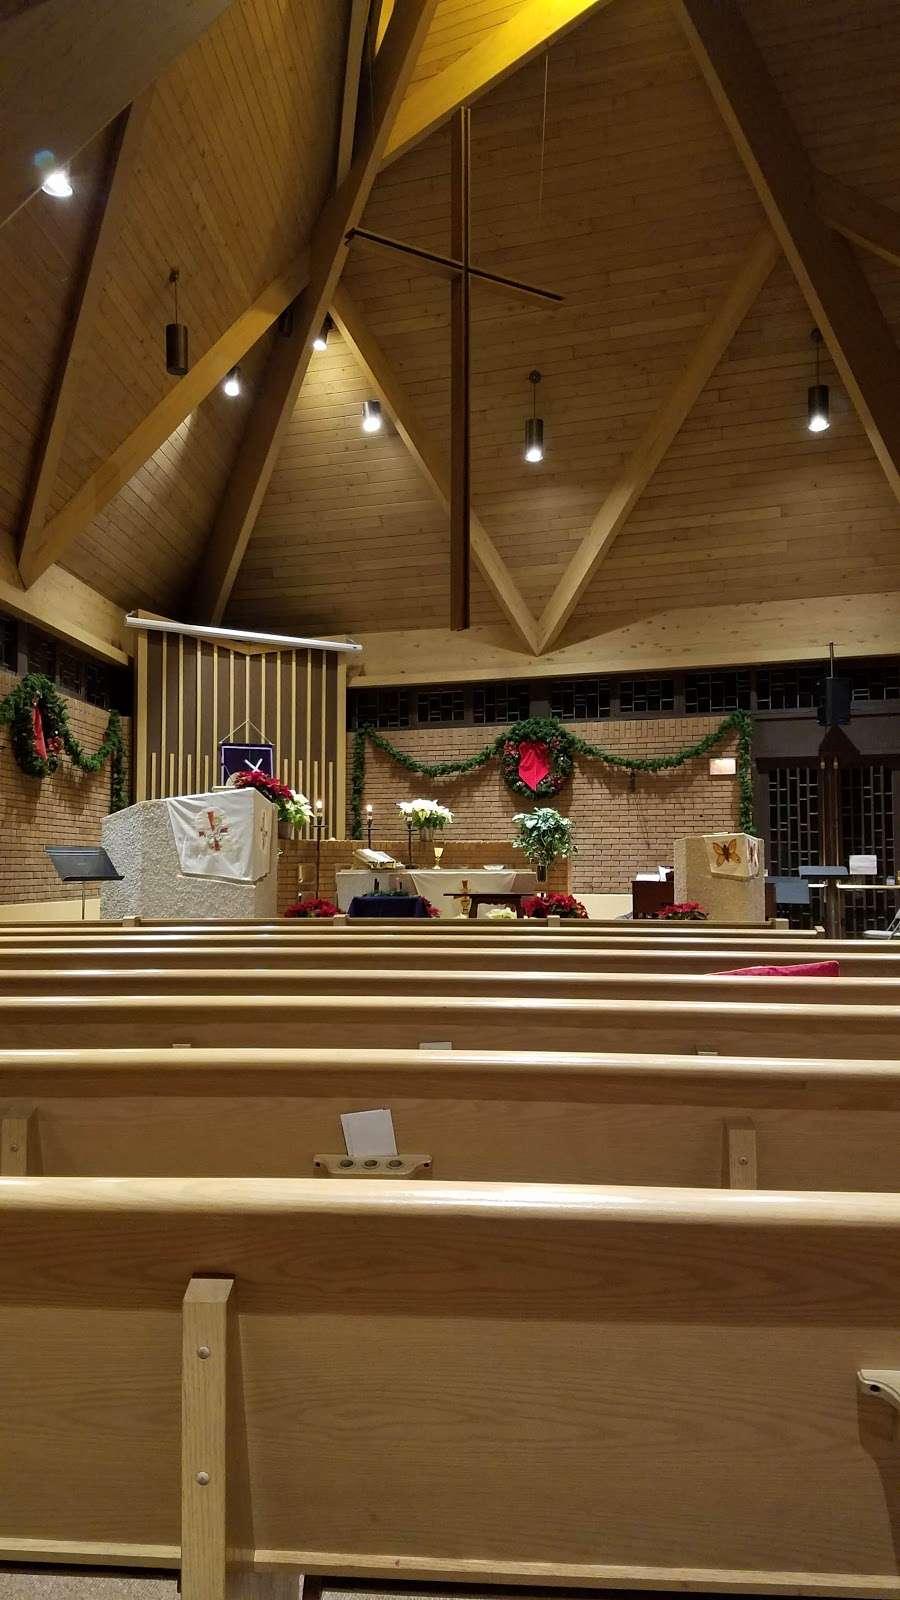 St Lukes Christian Community - church  | Photo 3 of 3 | Address: 9233 Shermer Rd, Morton Grove, IL 60053, USA | Phone: (847) 966-9233